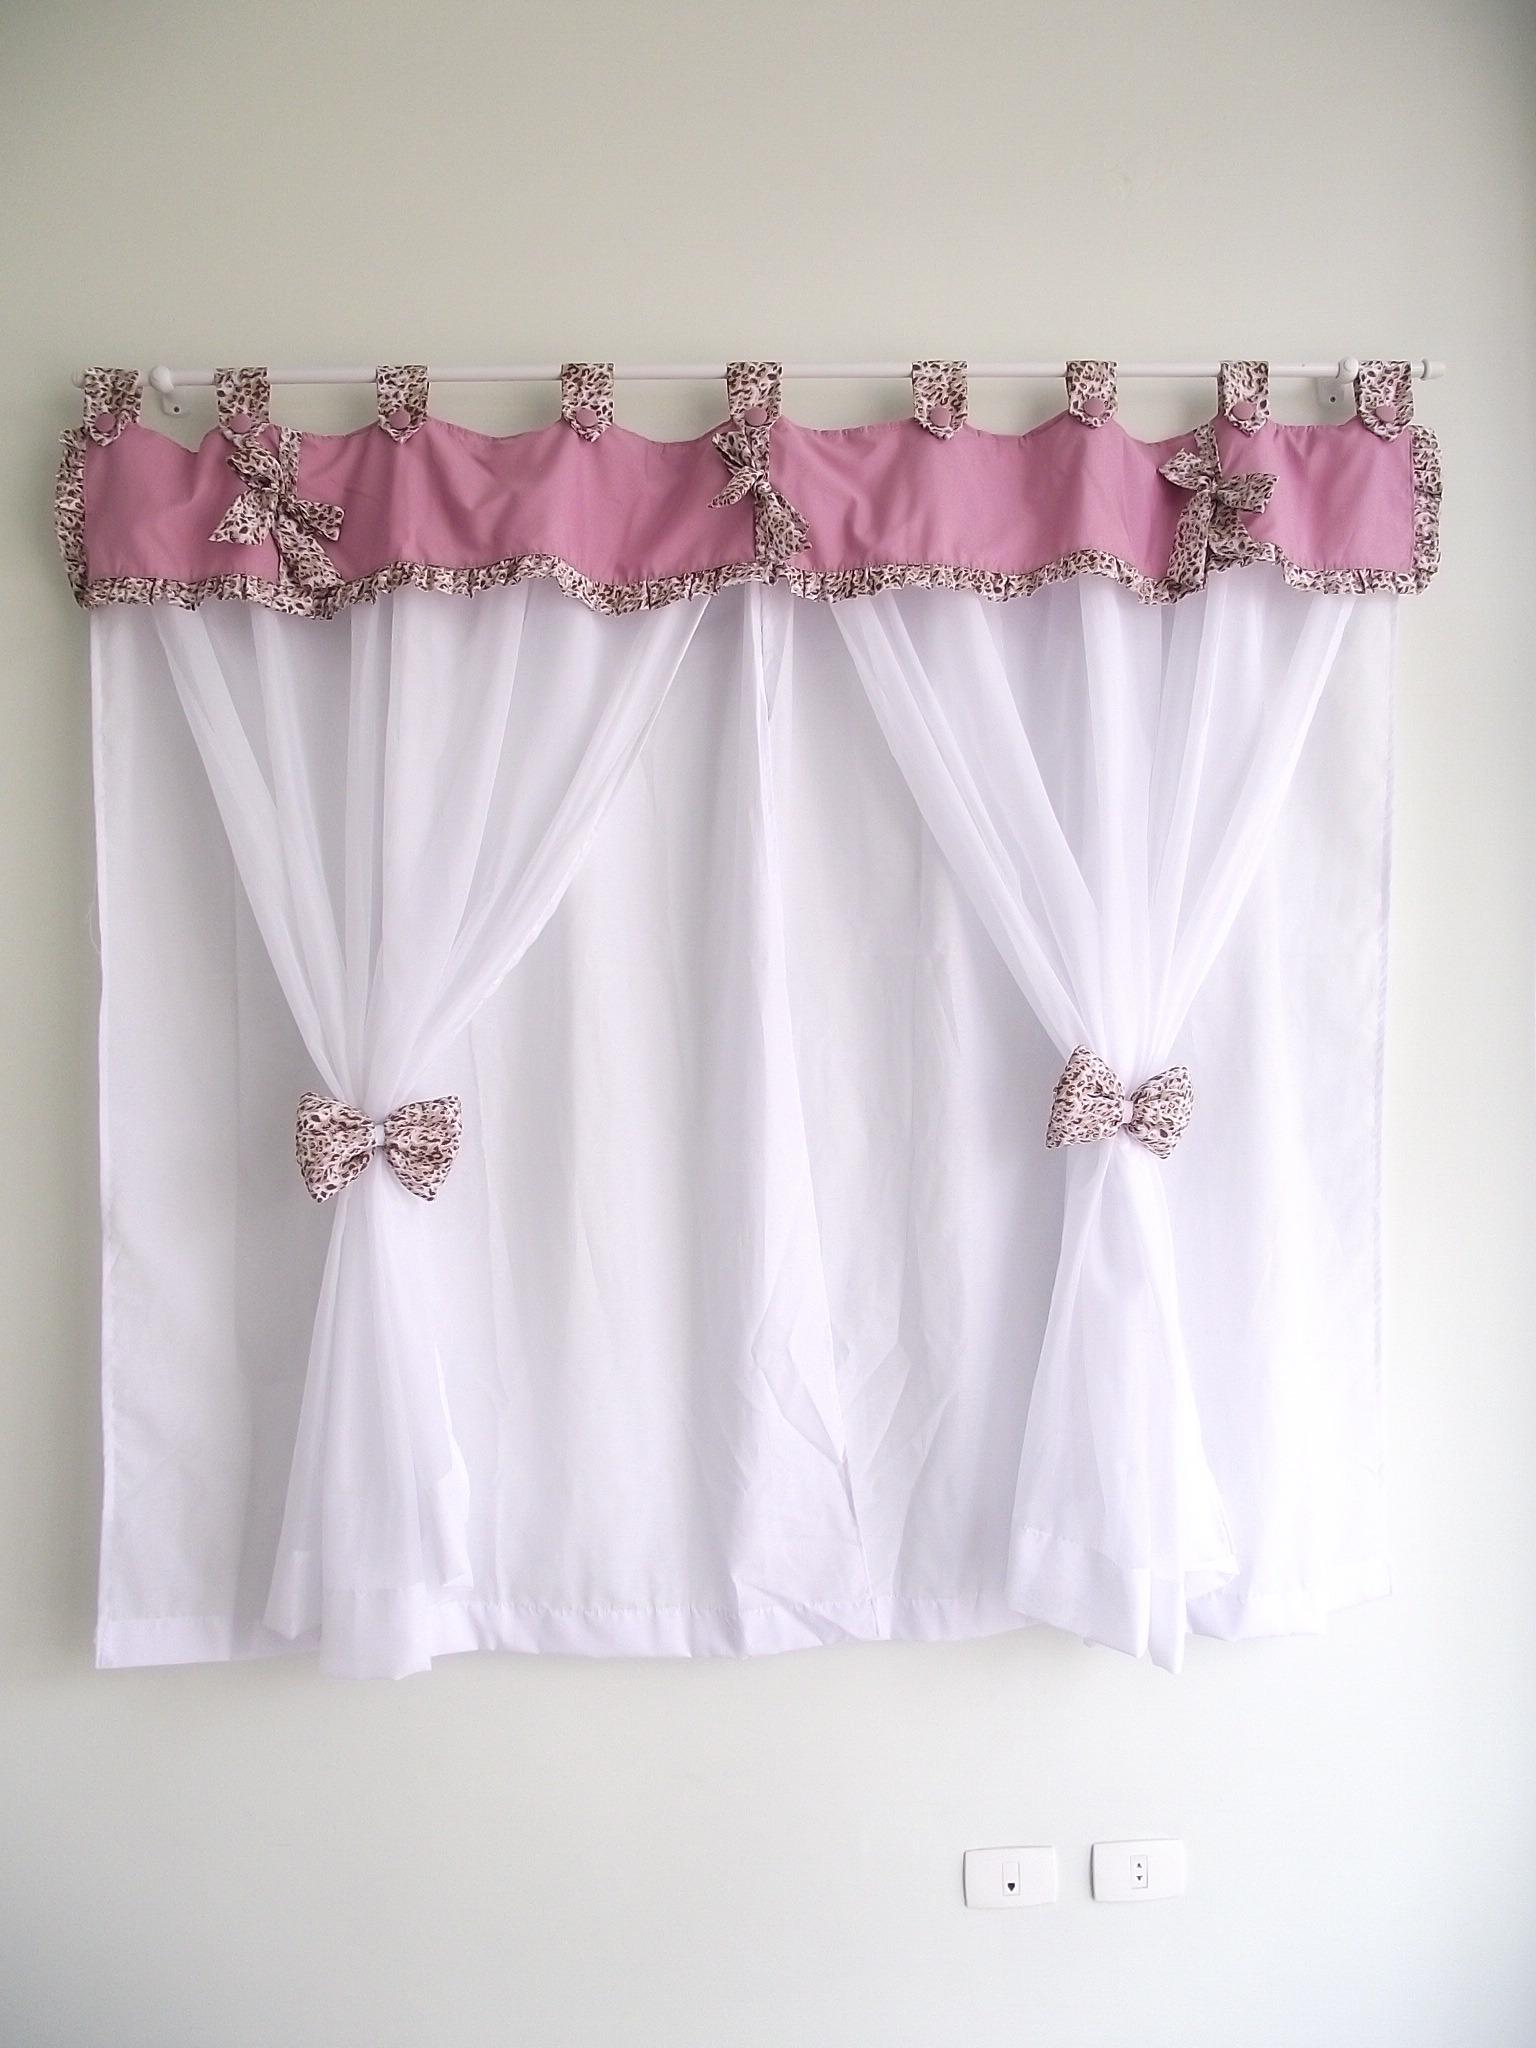 Cortina la o de fita ros on a natural sonho de beb - Modelos de cortinas infantiles ...